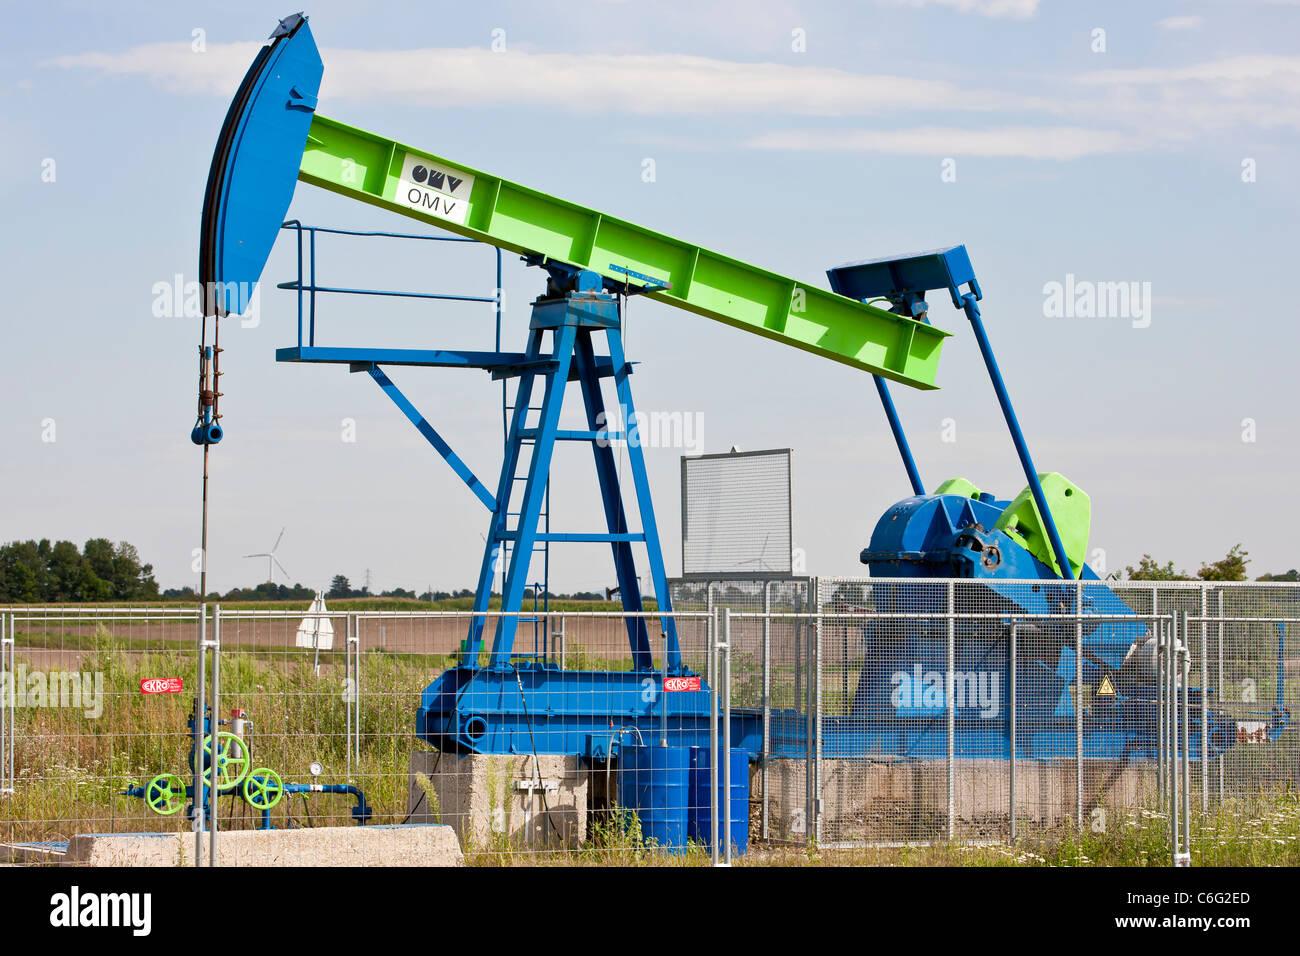 OMV crude oil pump. - Stock Image